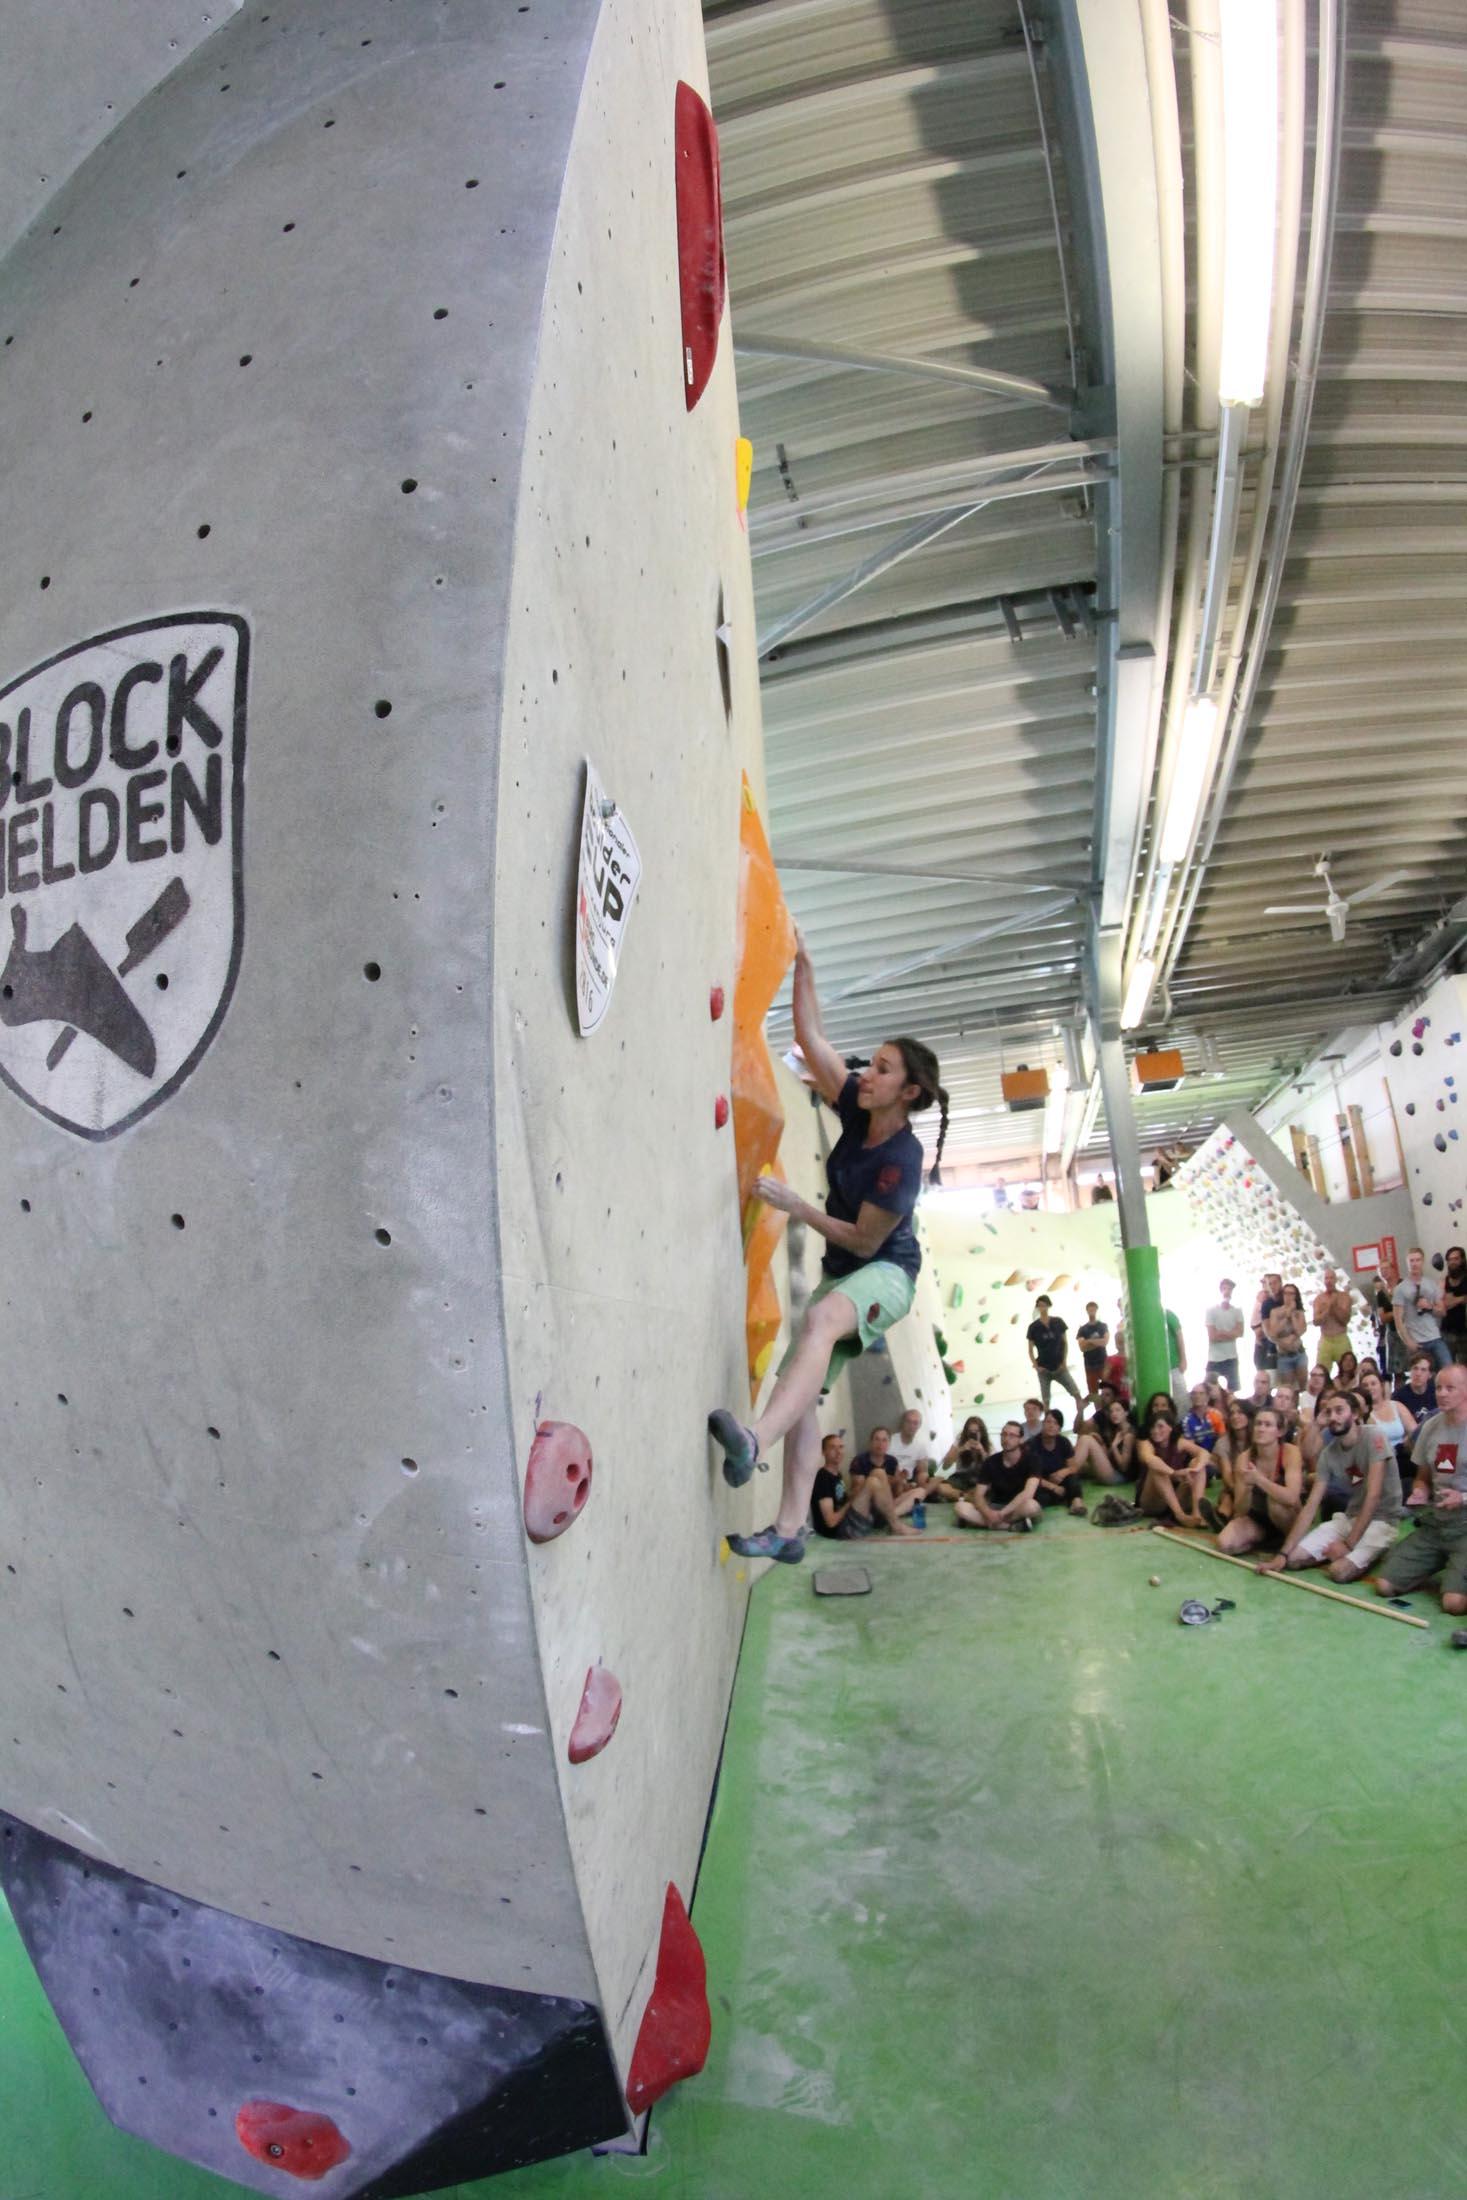 Finale, internationaler bouldercup Frankenjura 2016, BLOCKHELDEN Erlangen, Mammut, Bergfreunde.de, Boulderwettkampf07092016477